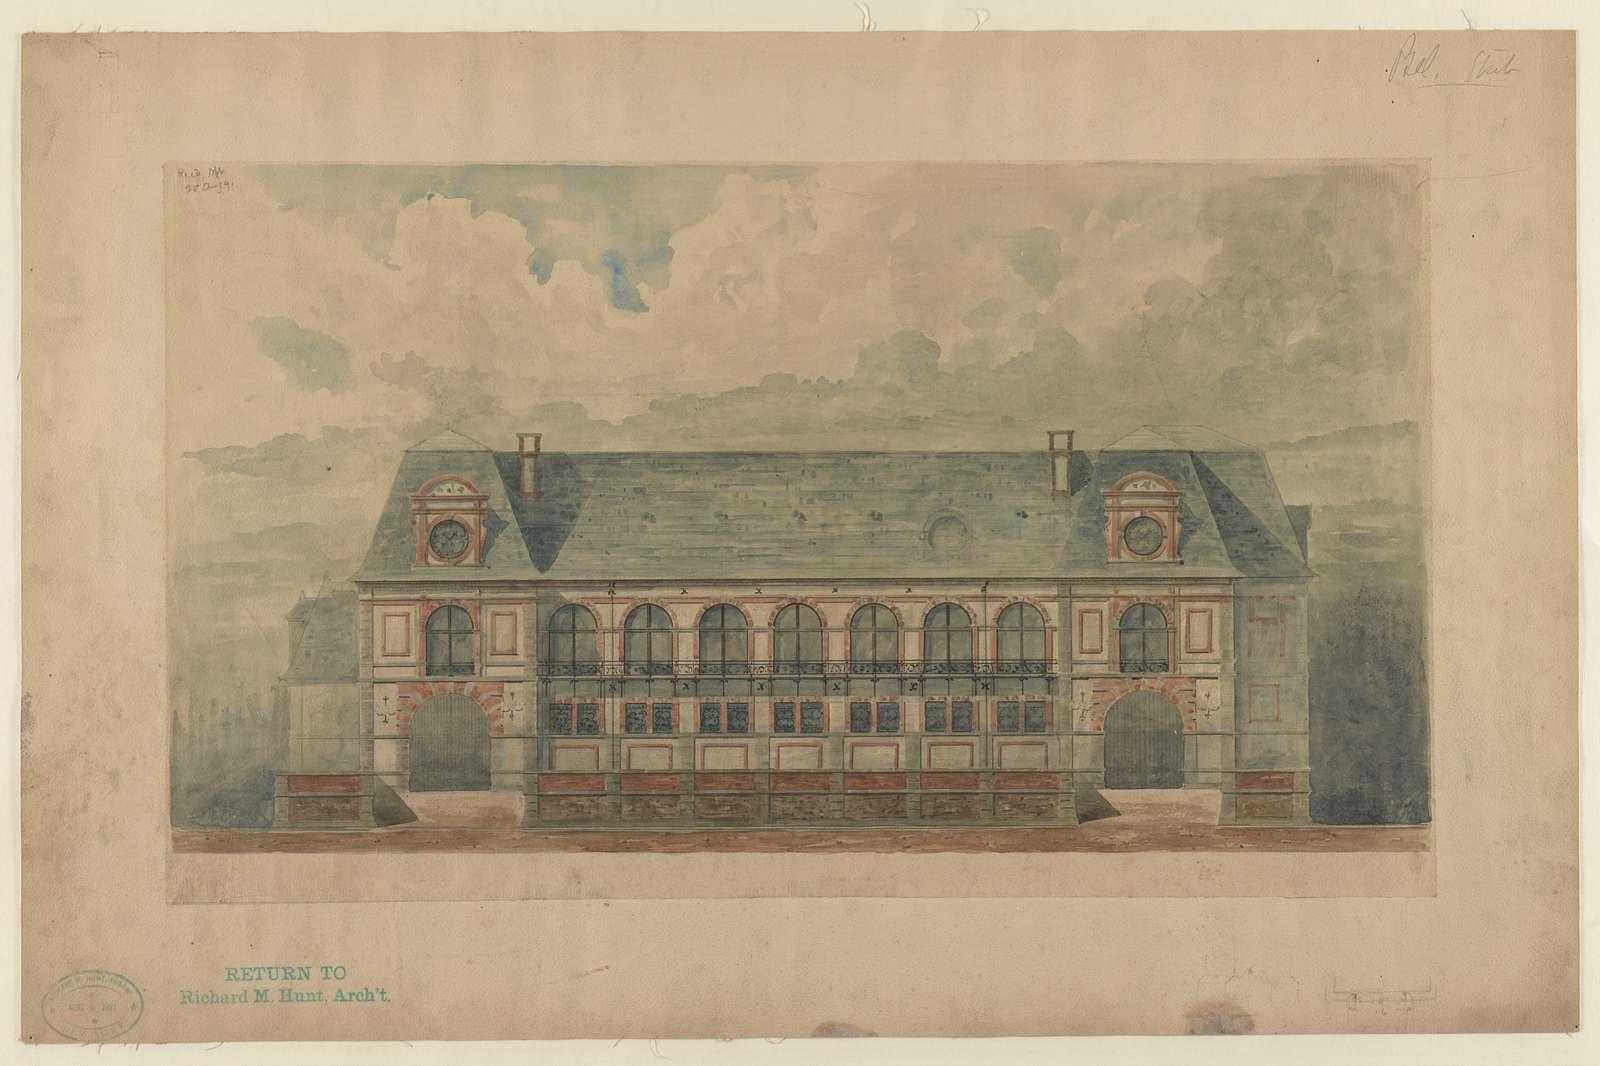 [Stable at Belcourt, summer estate for Oliver H.P. Belmont, Newport, R.I.] / R.M. Hunt archt.